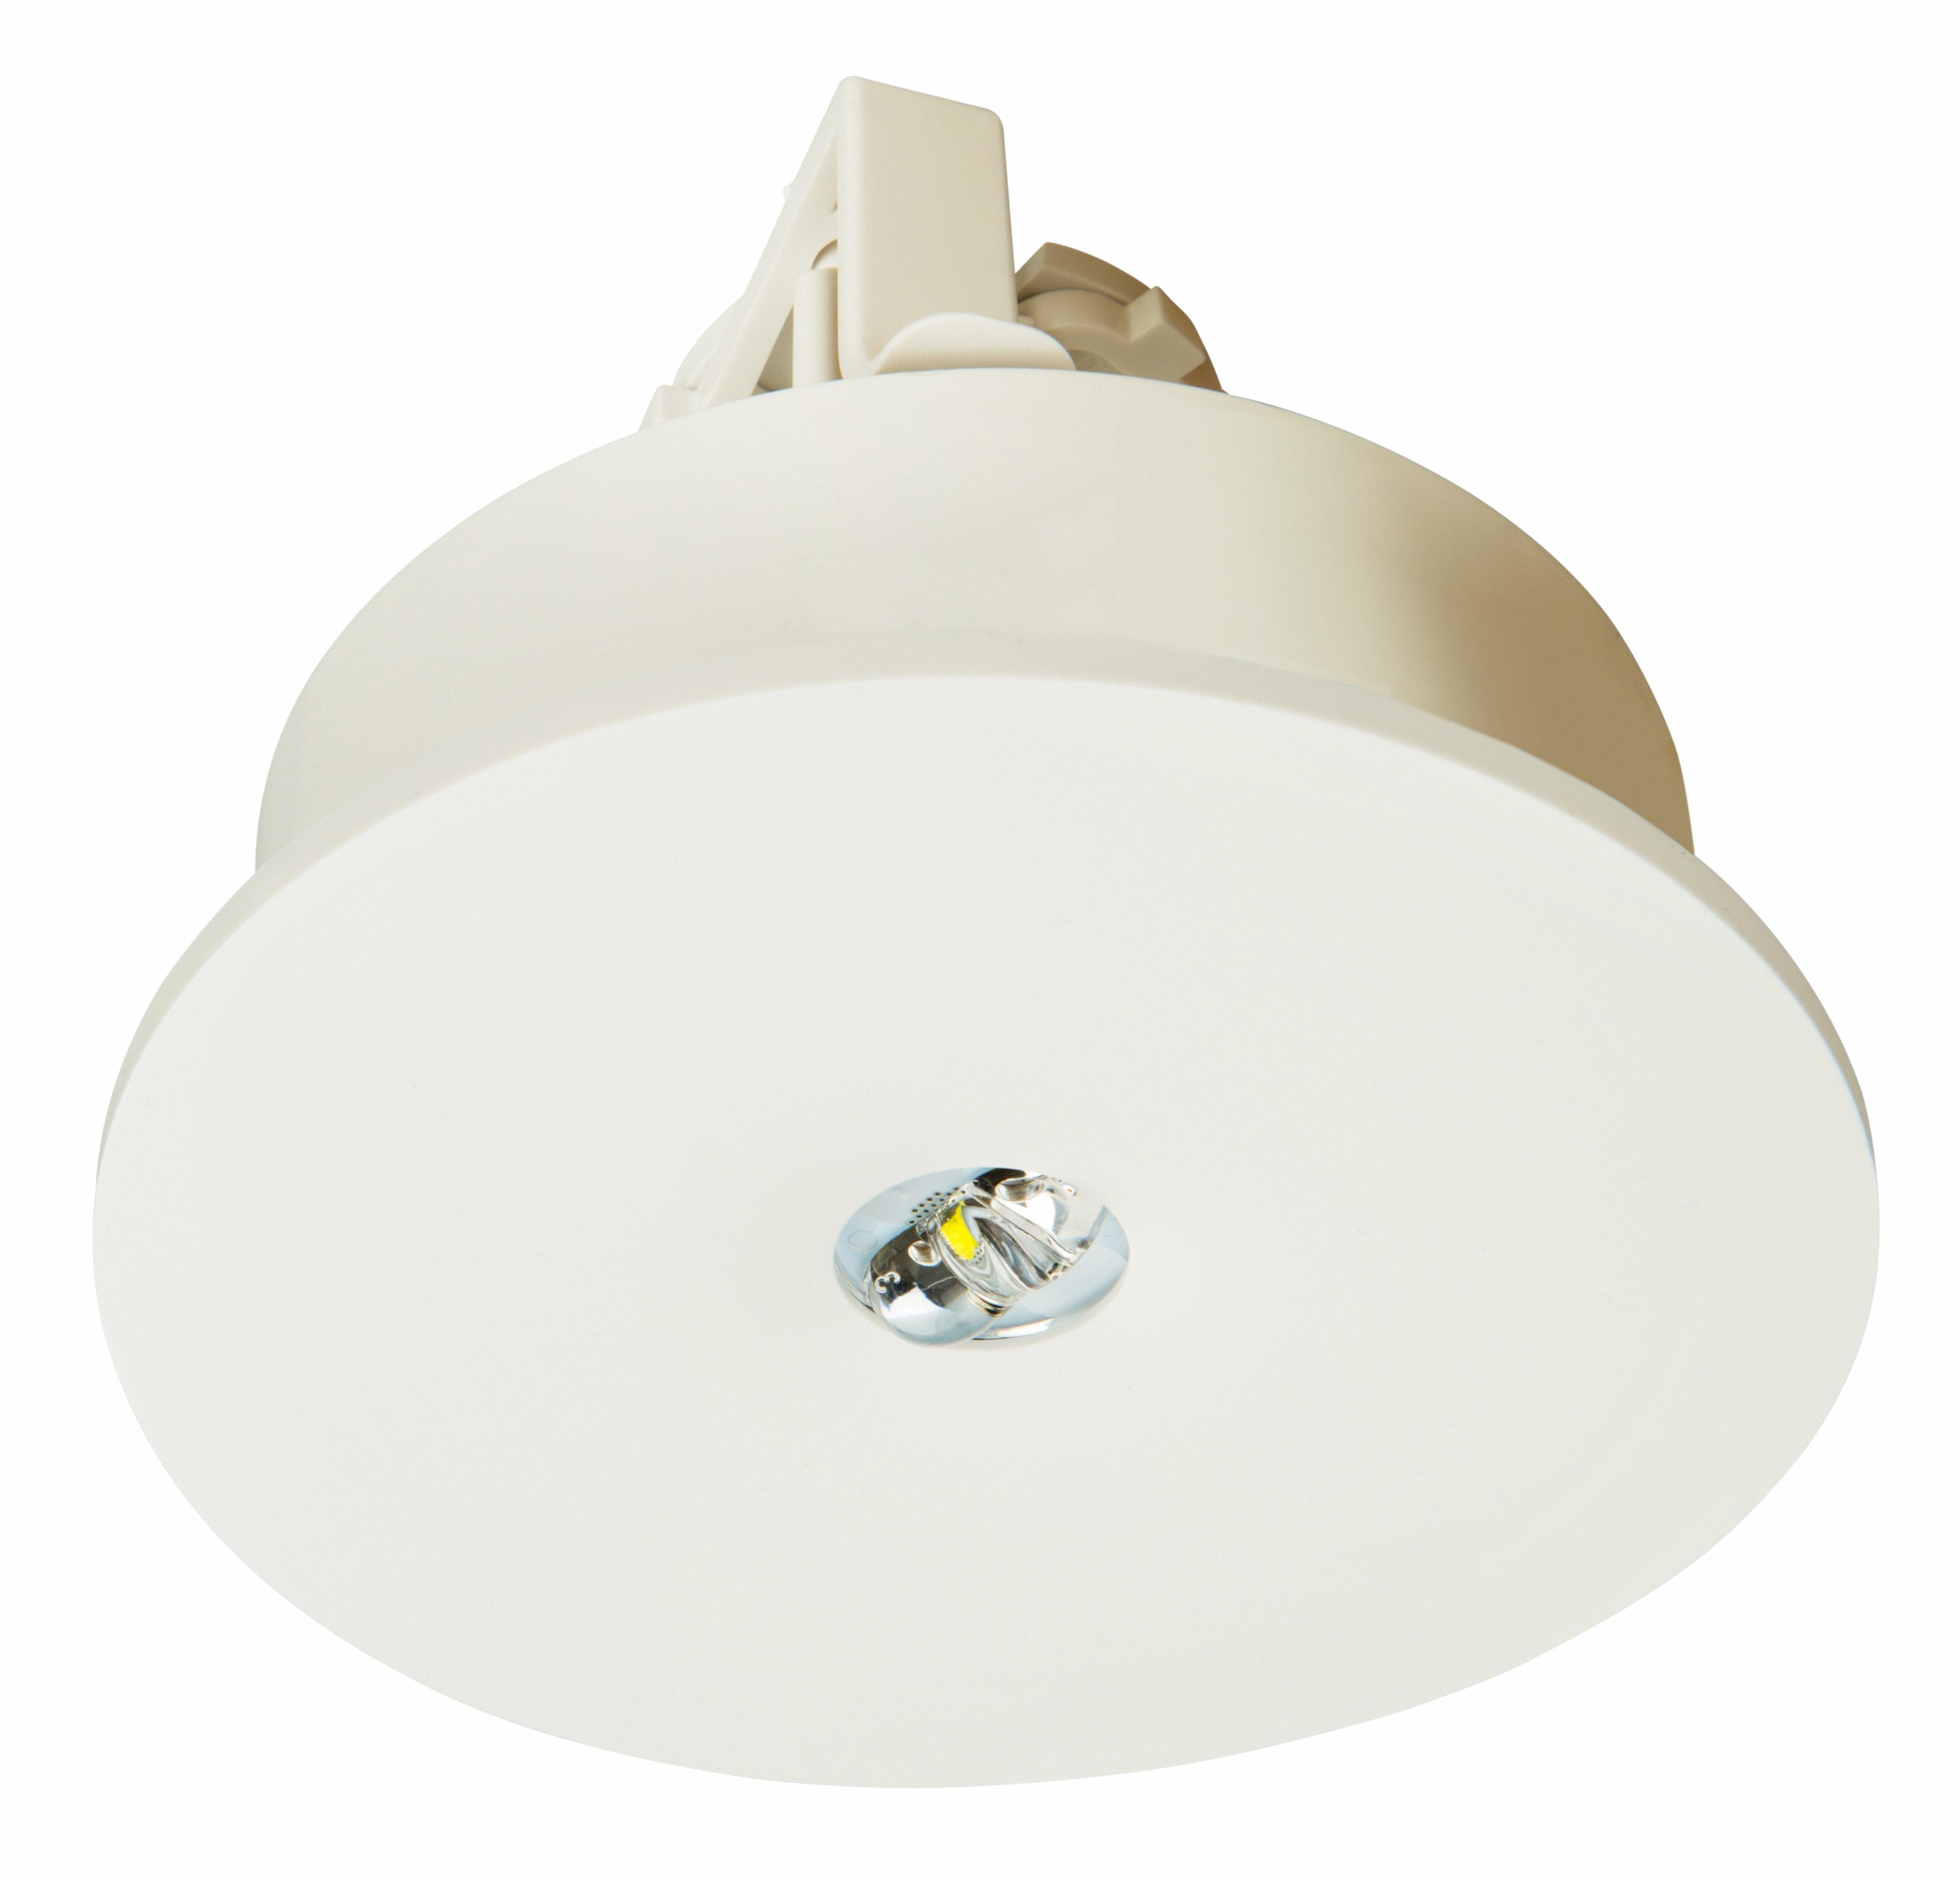 1 Stk Notleuchte IL Wireless 1x3W ERT-LED 3h 230 VAC Flur NLILEF023W